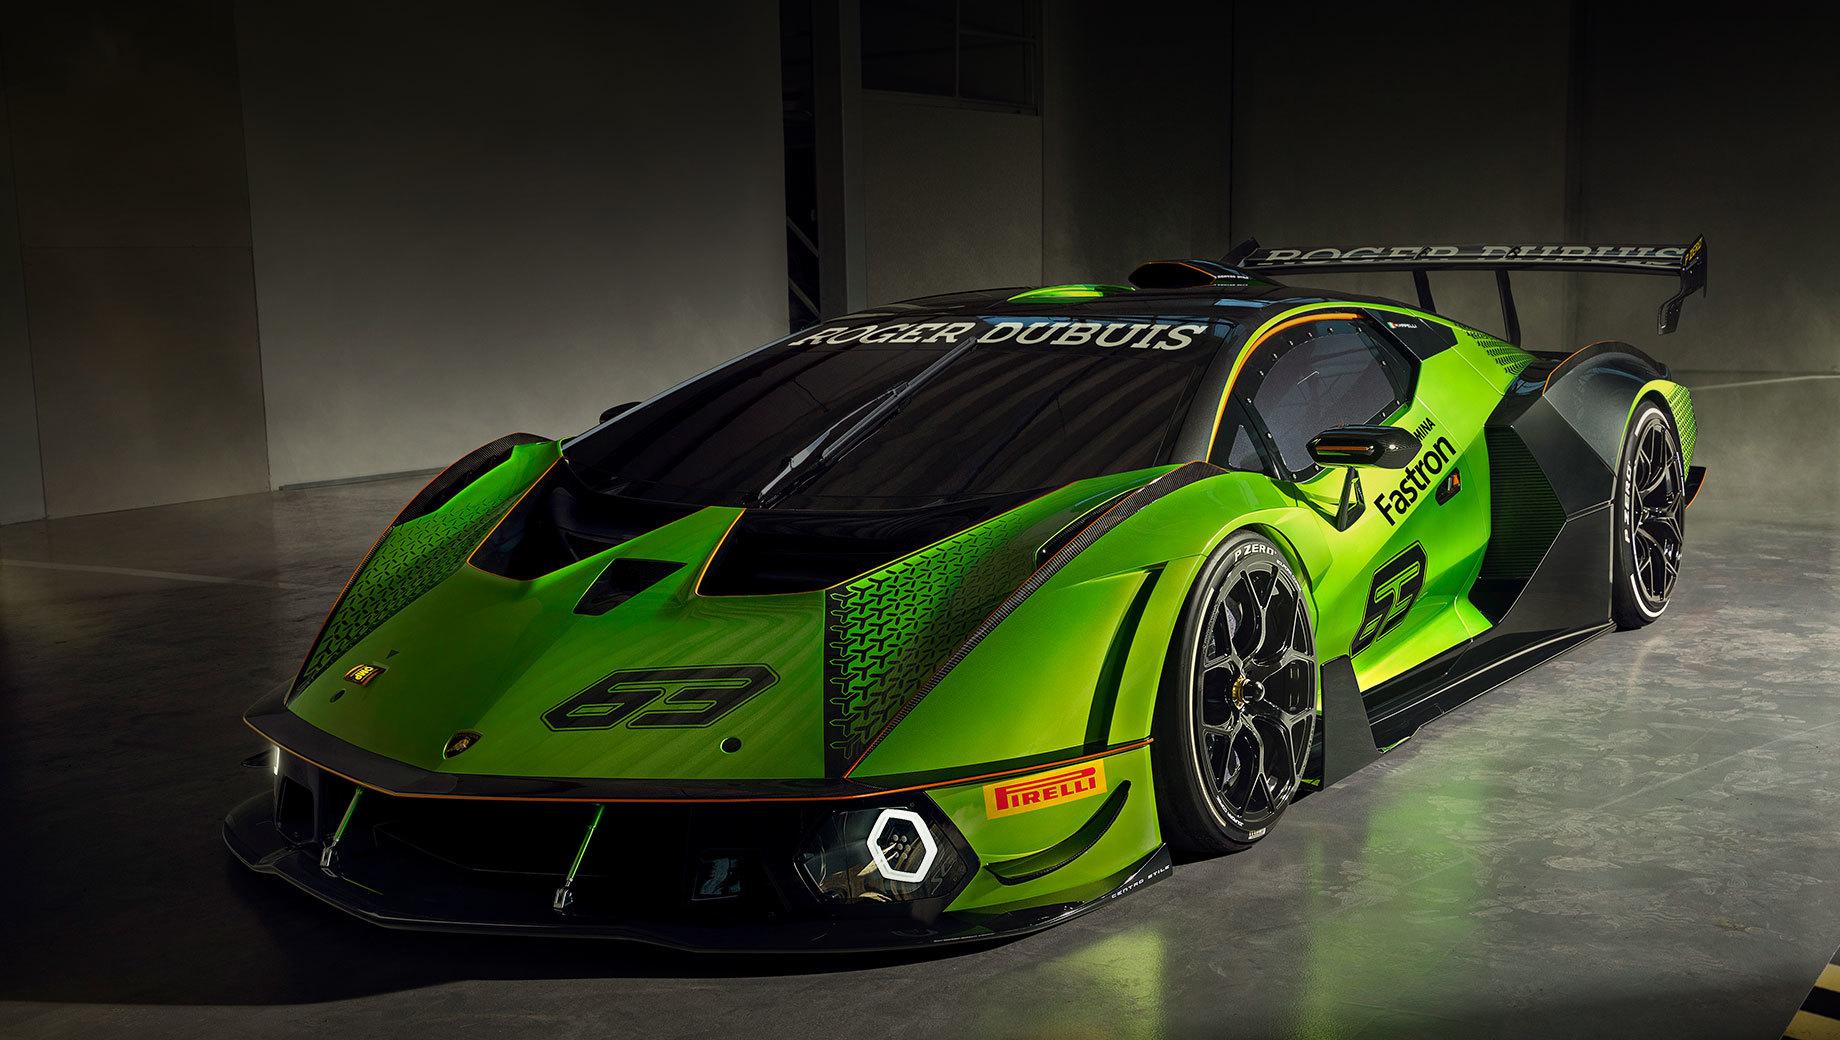 Гиперкар Lamborghini Essenza SCV12 родился для трека